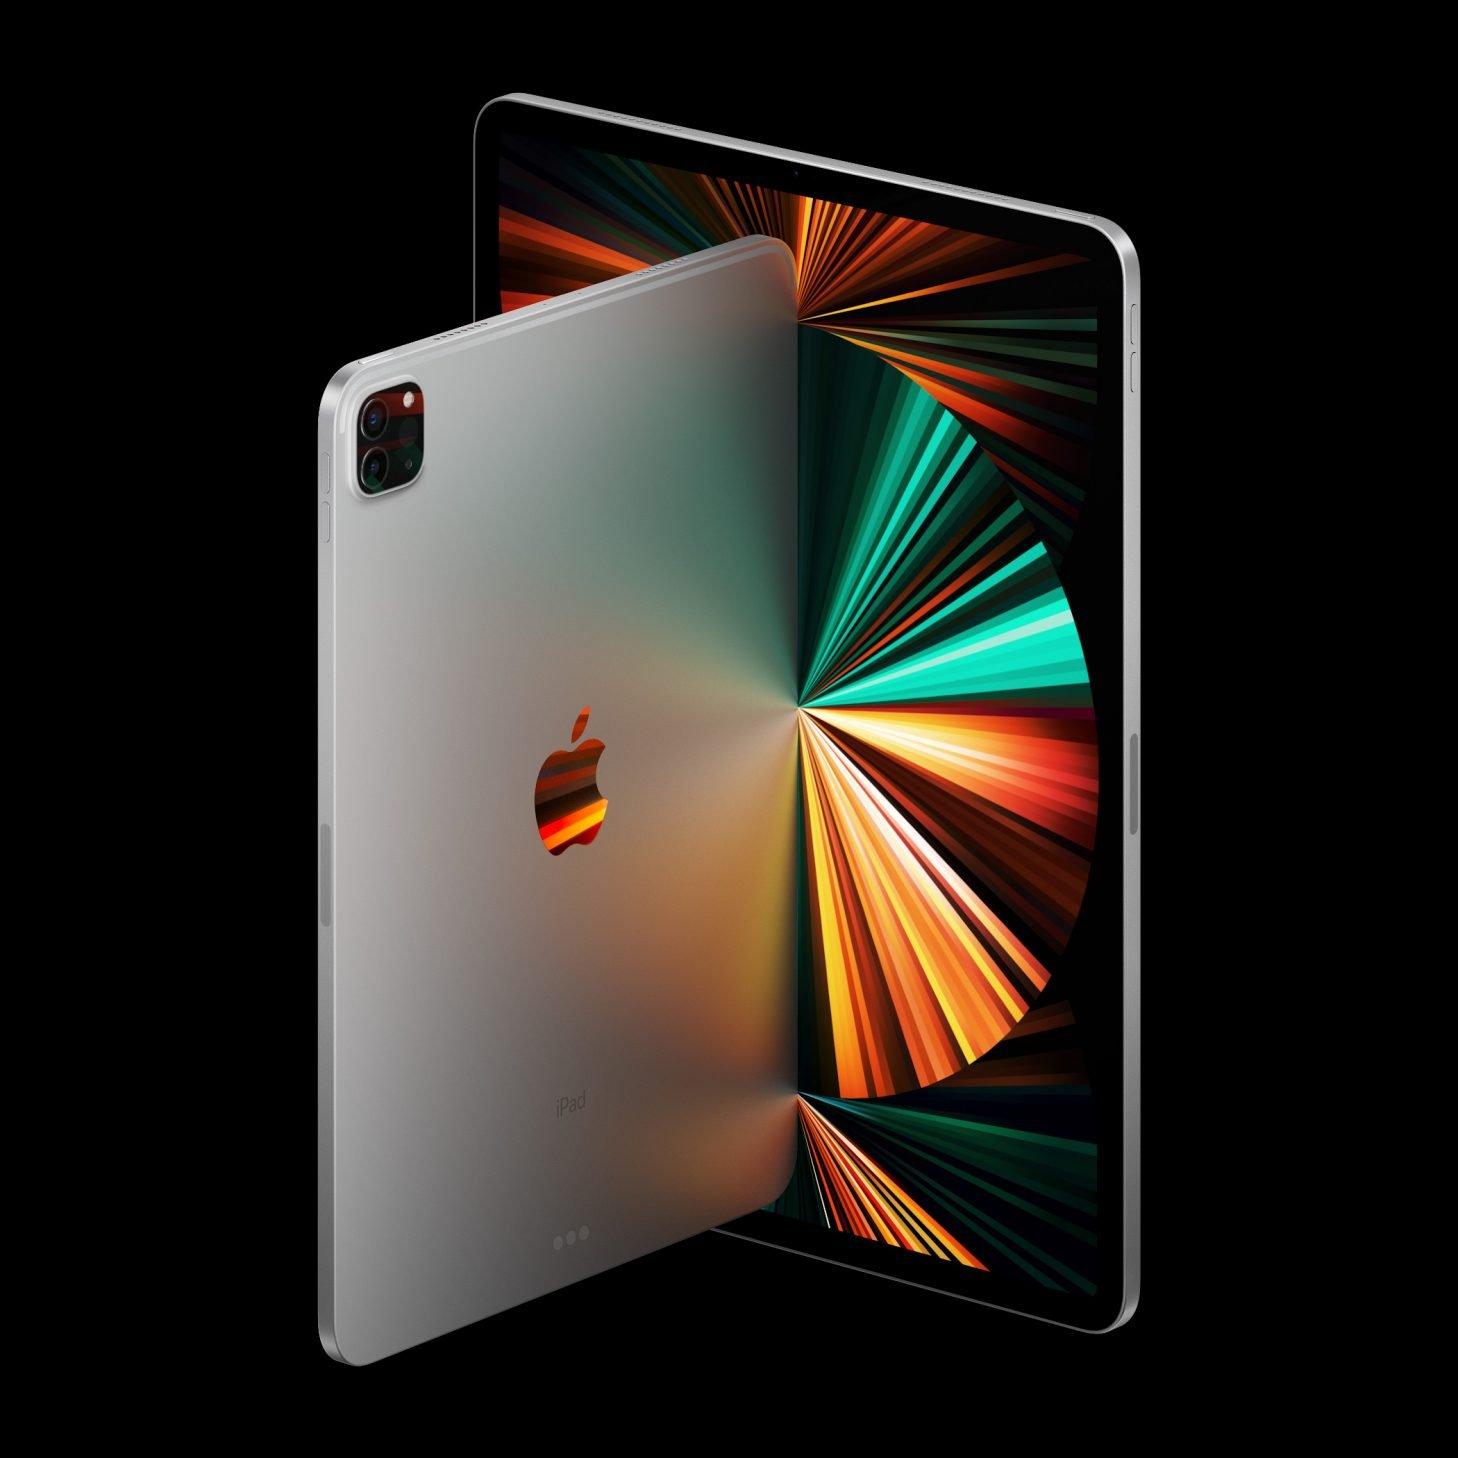 apple ipad pro spring21 hero 04202021